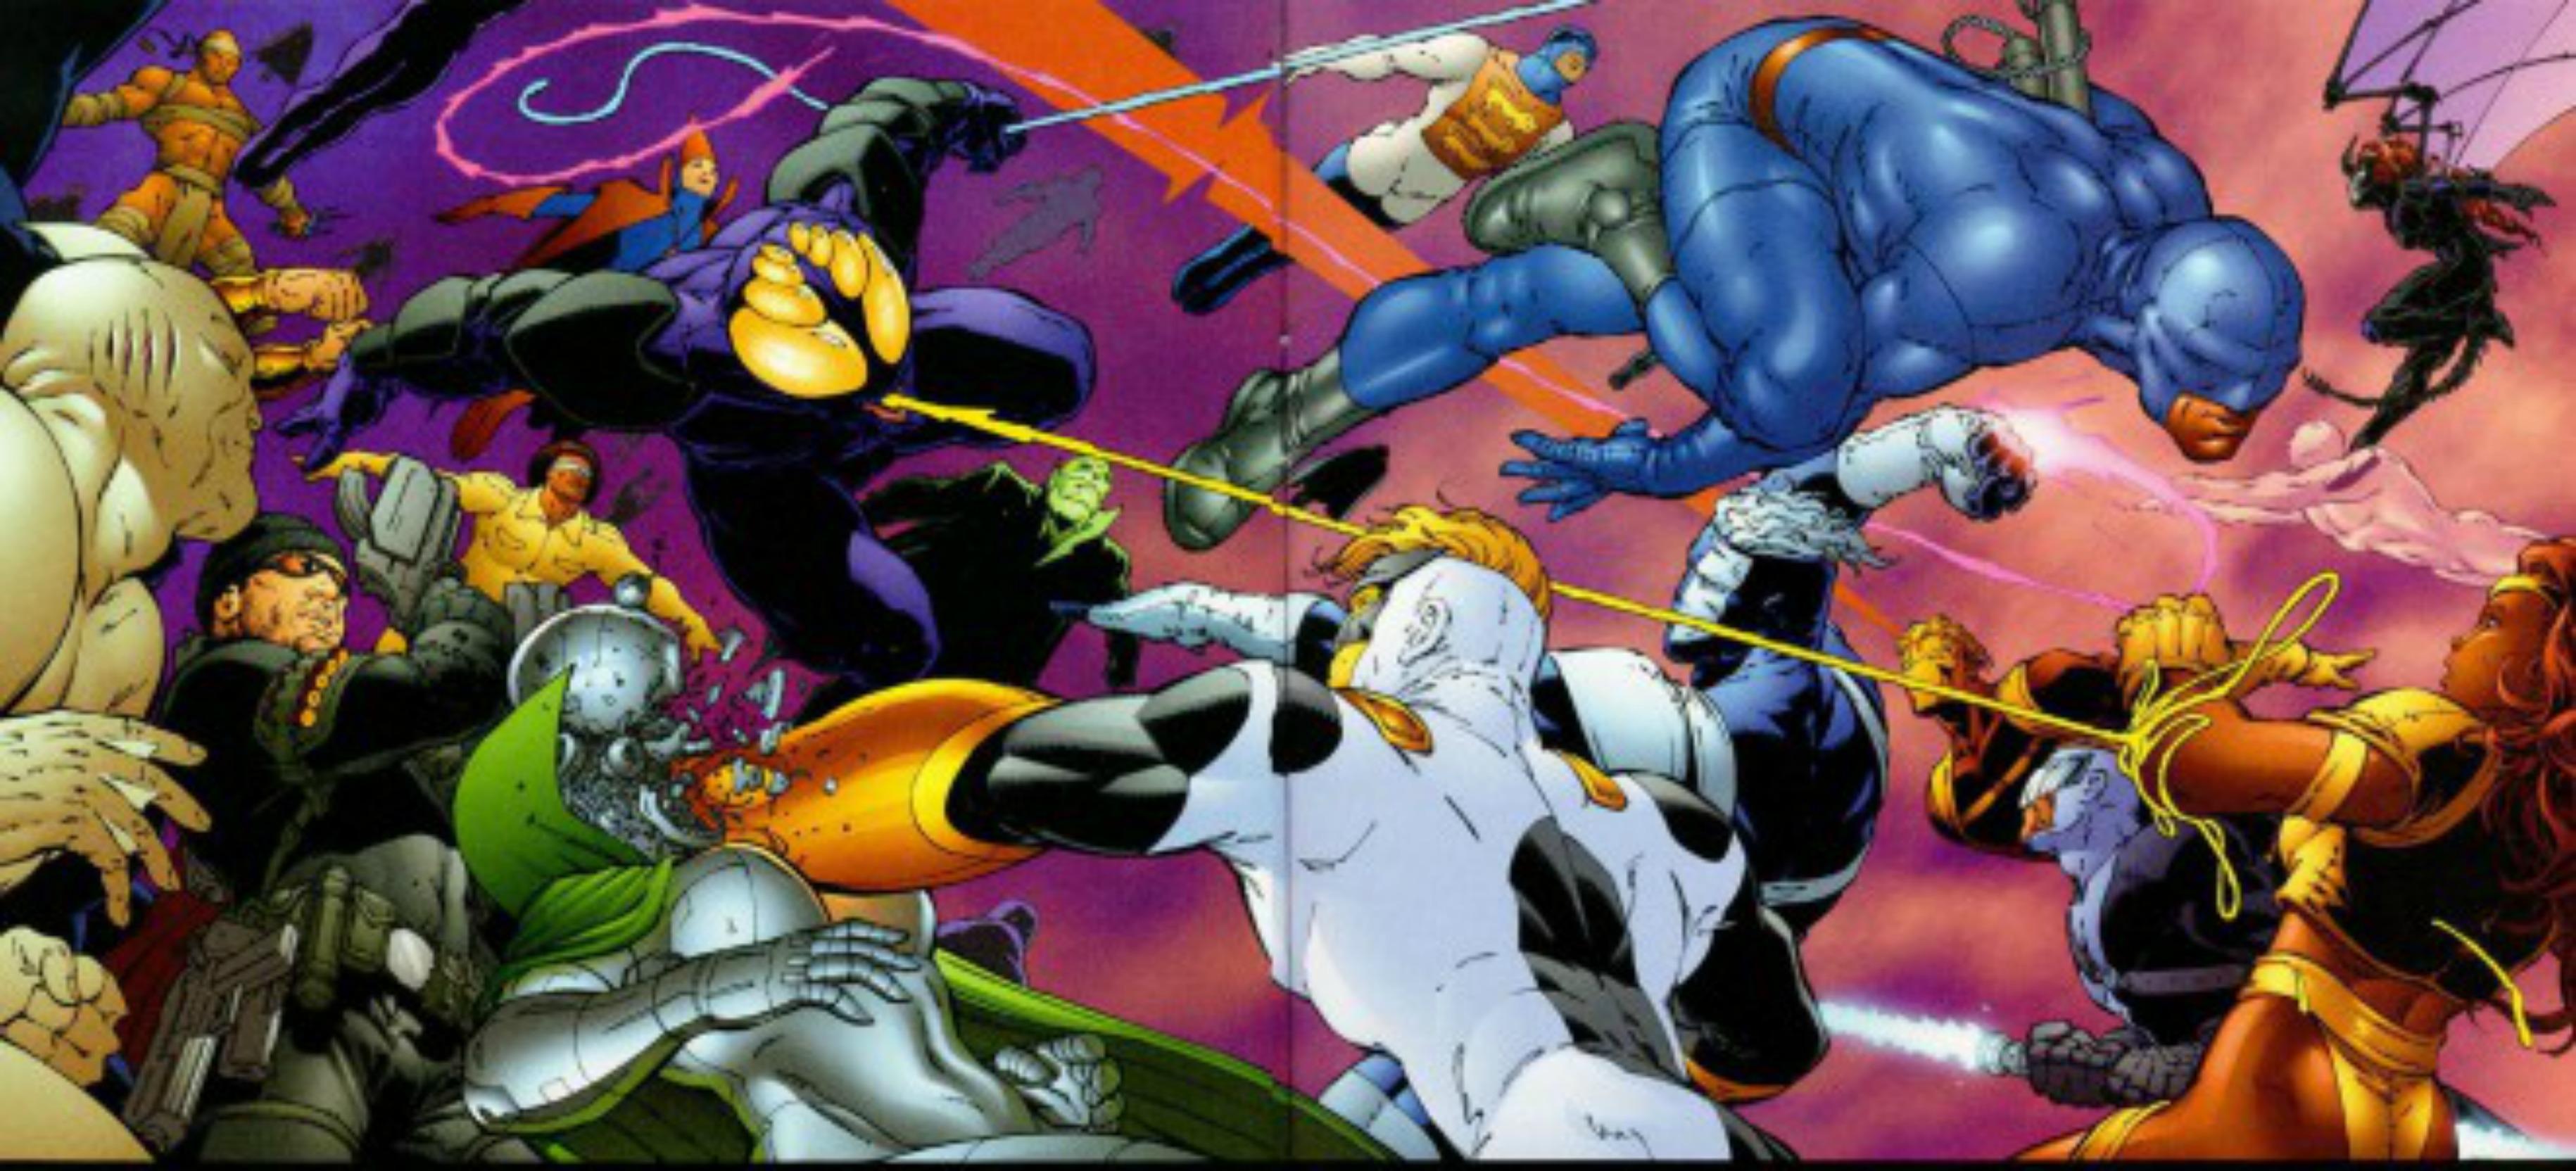 multivers crisis - [Multivers Crisis] La Fin de Tout [Justice League] 908417TheAuthorityVol116pagesJackKirbyanalogue660x513